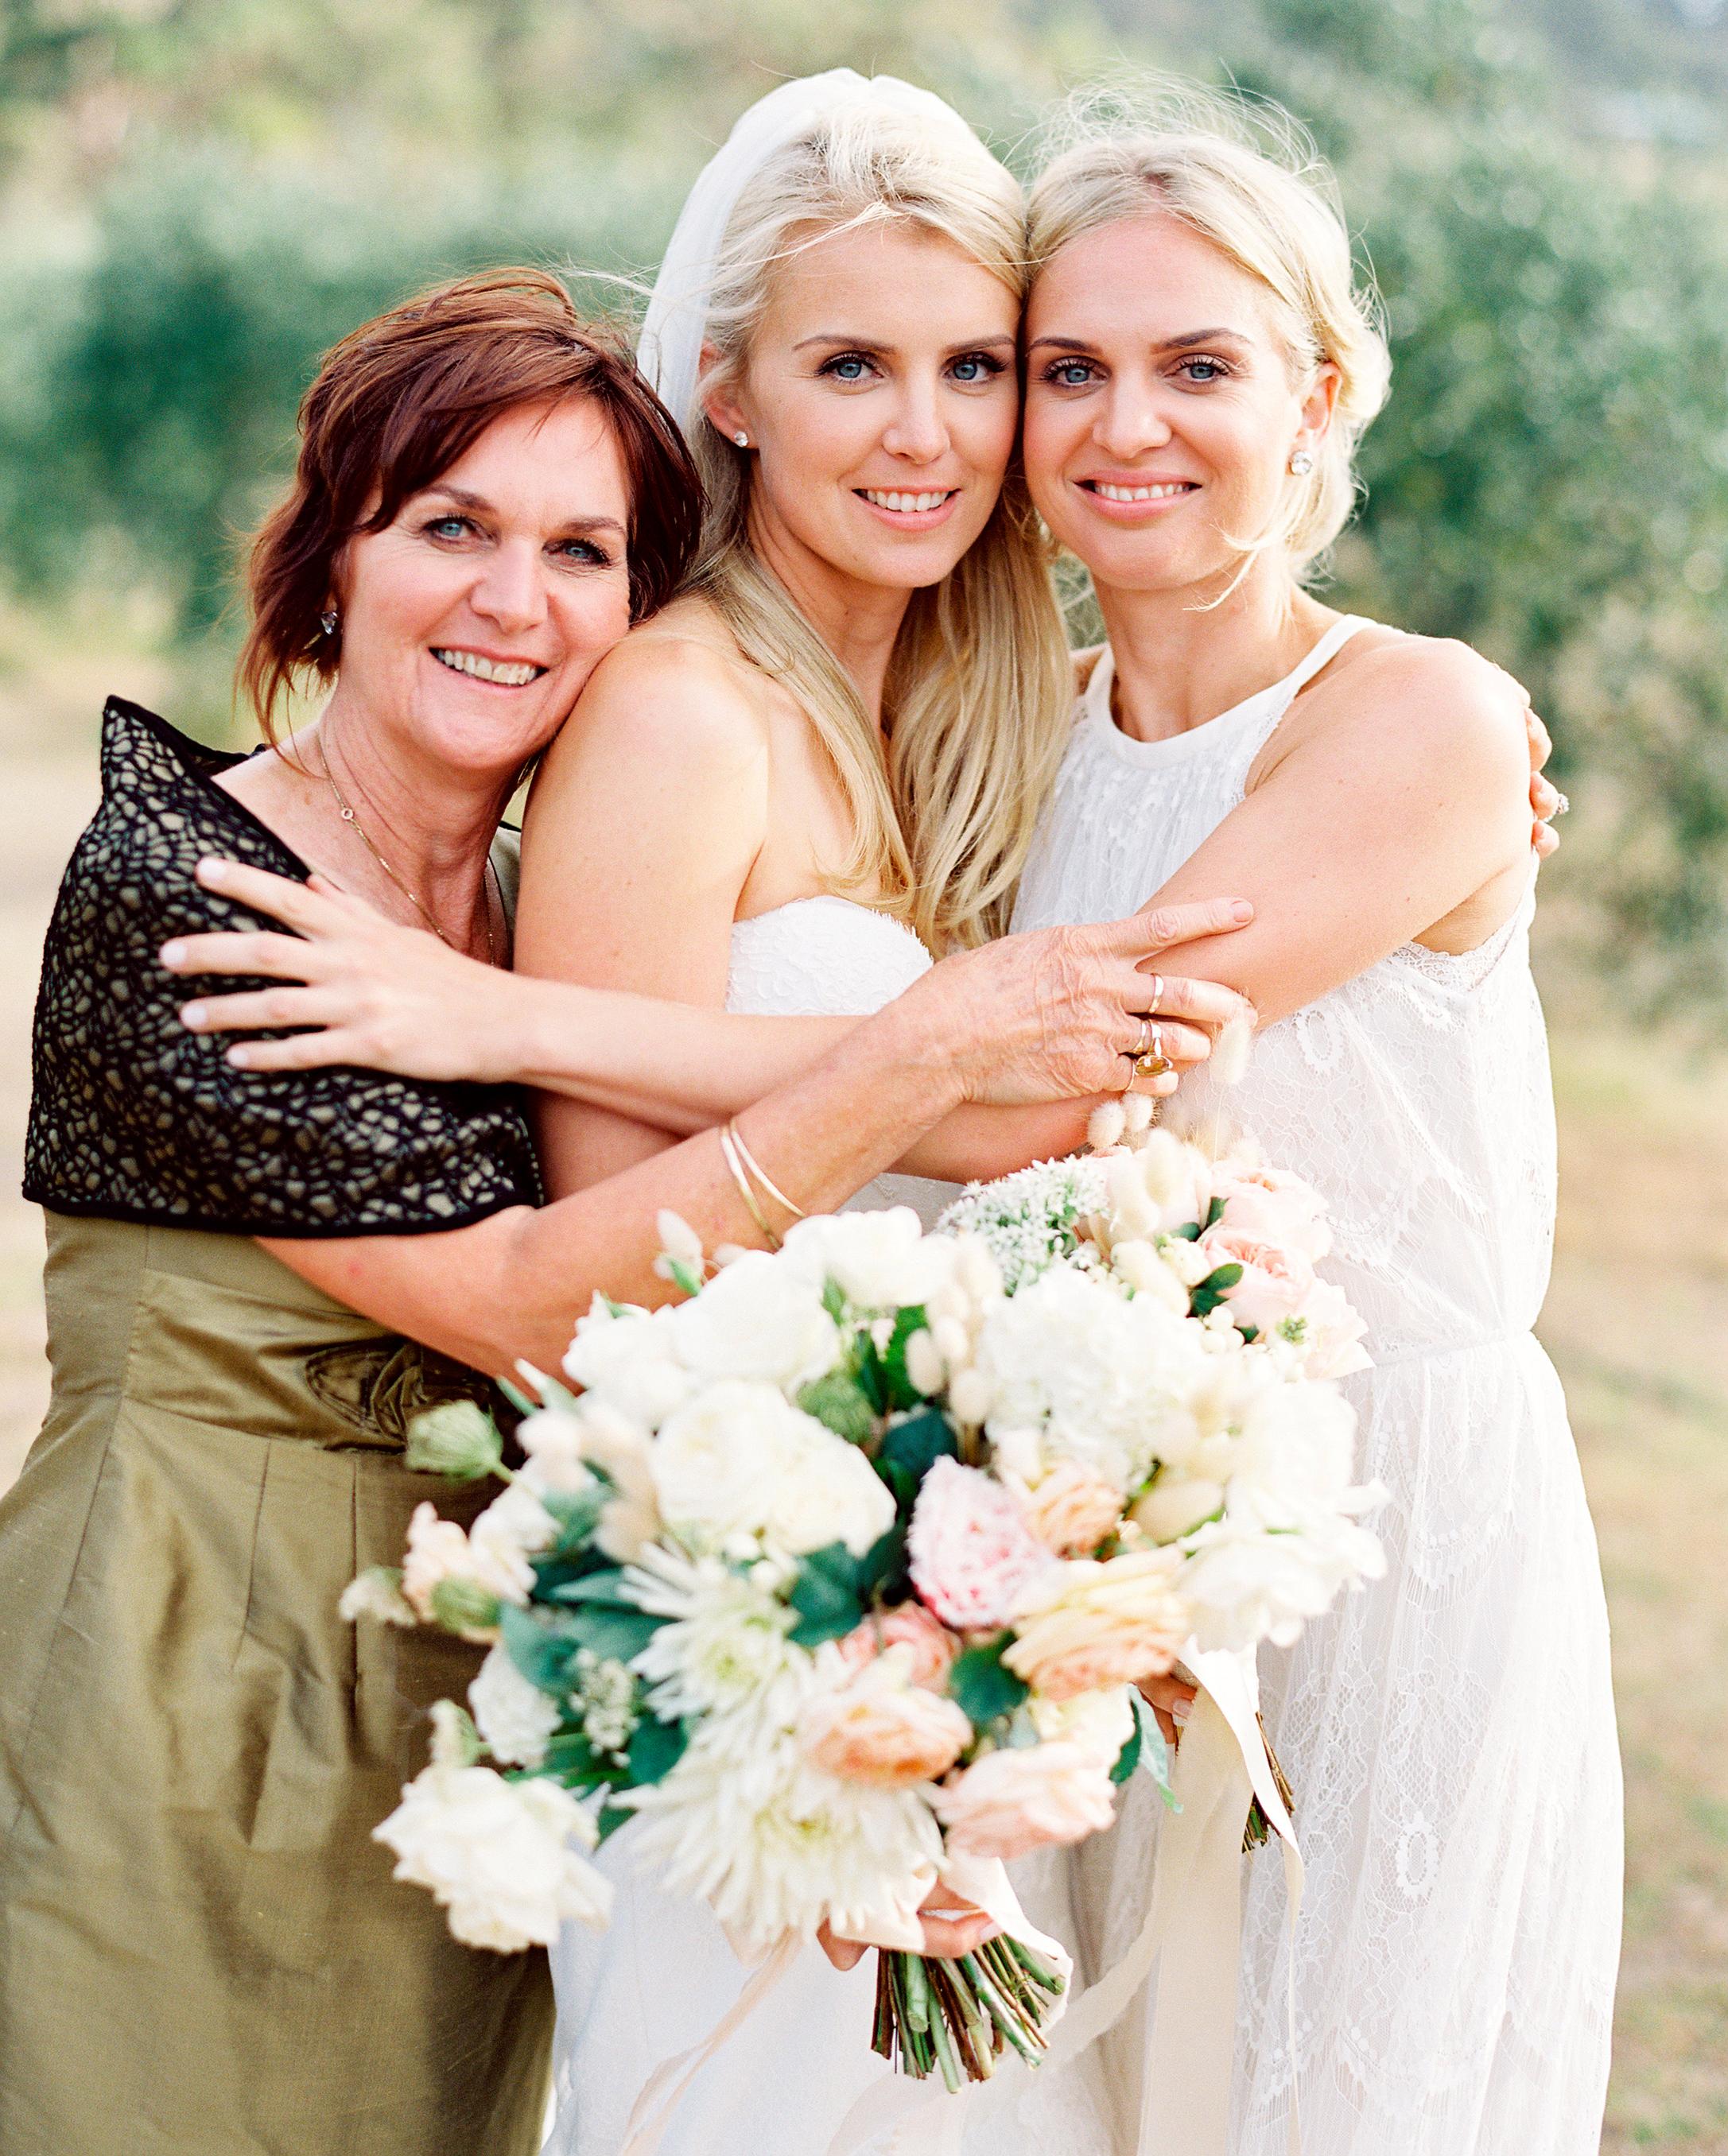 jemma-michael-wedding-family-002603008-s112110-0815.jpg